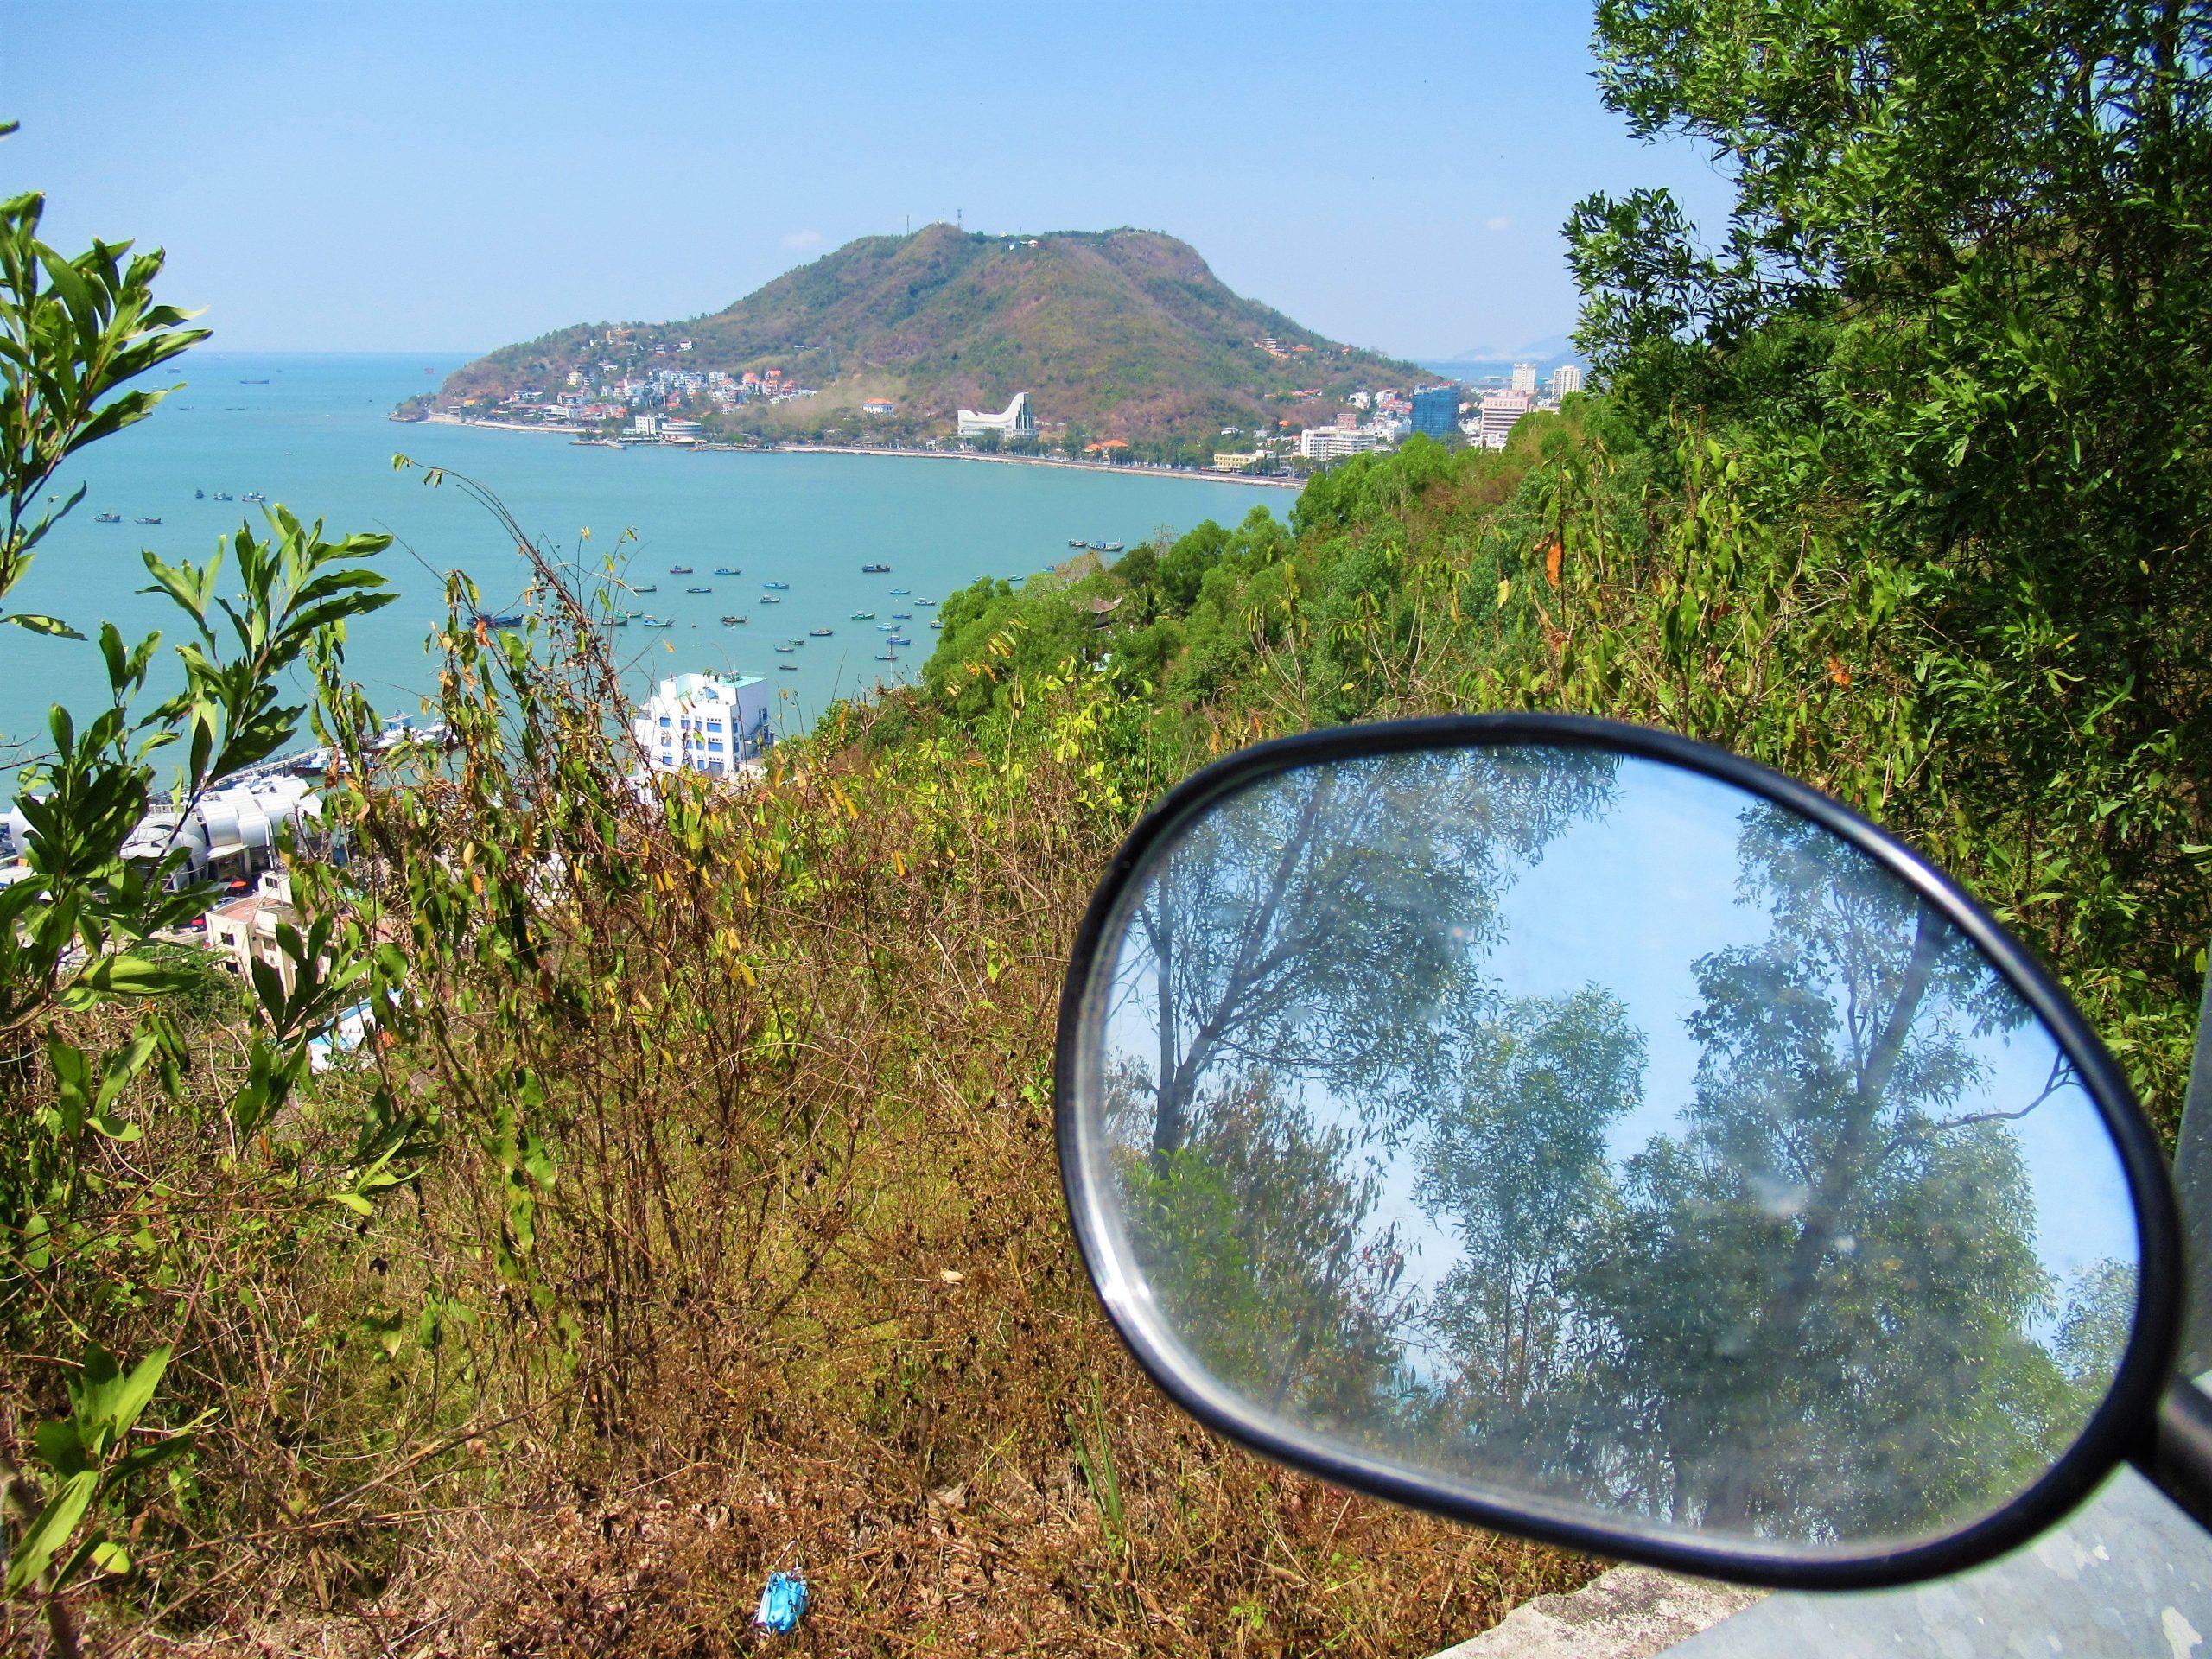 View from 'Small Mountain', Vung Tau, Vietnam